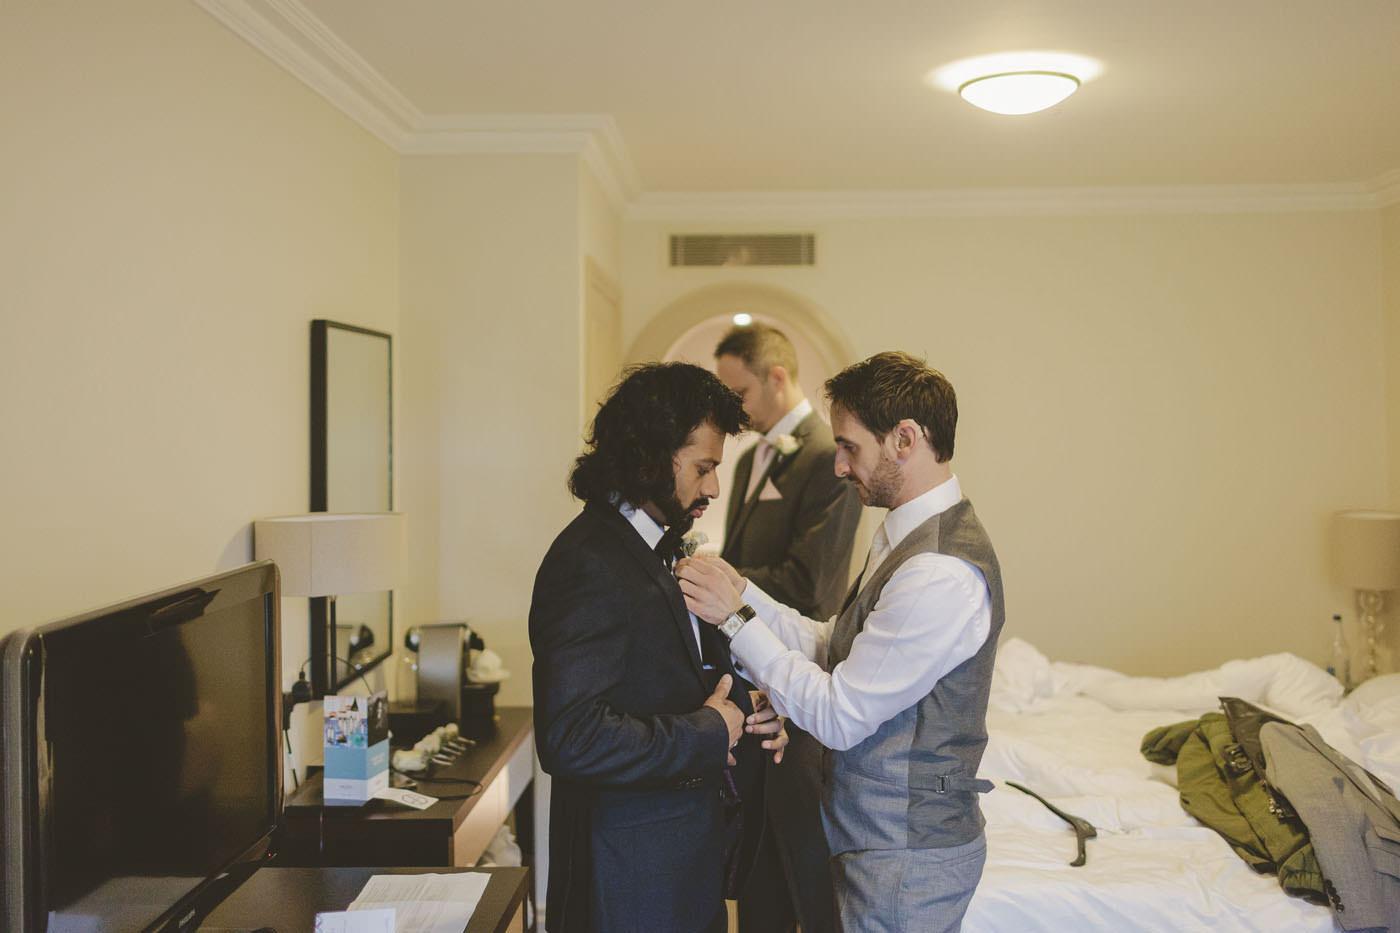 edmundjasveen burford bridge hotel wedding photographer 0009